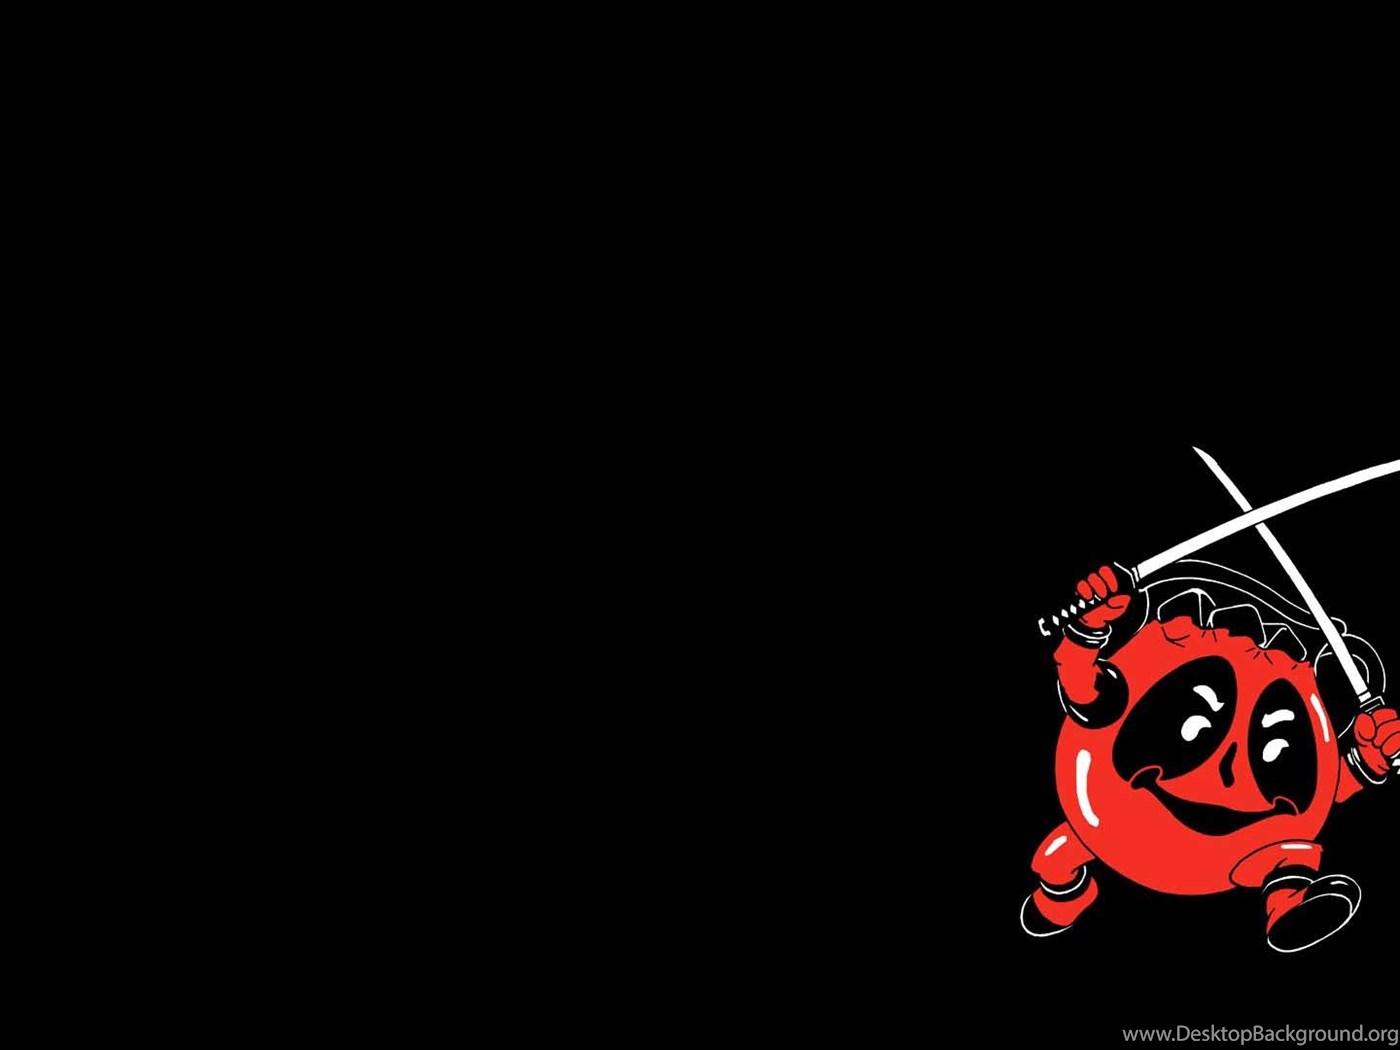 Cool Deadpool Wallpapers Hd Download Free Desktop Background